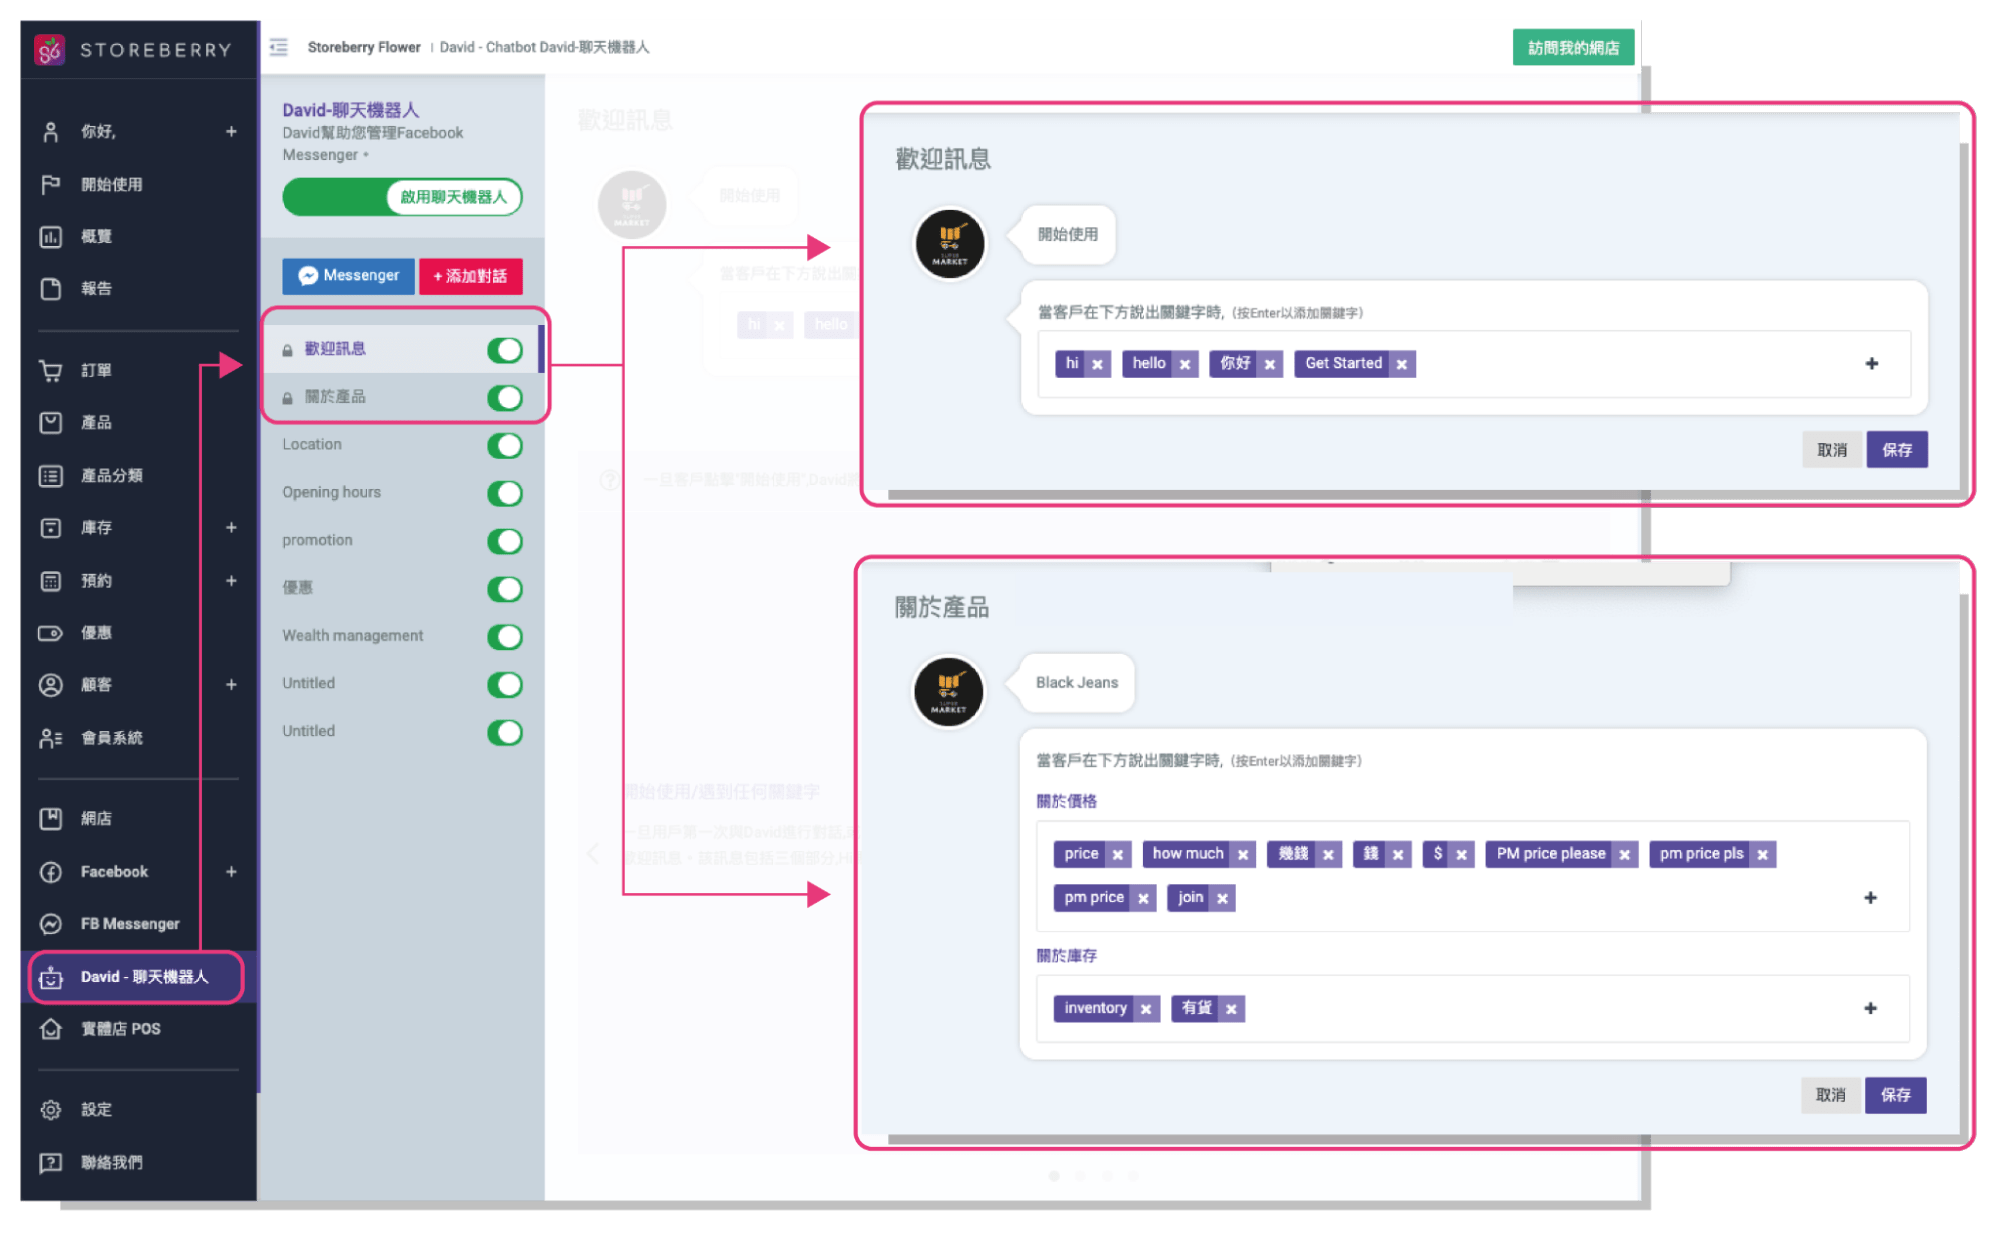 Retail Chatbot (David) Setting